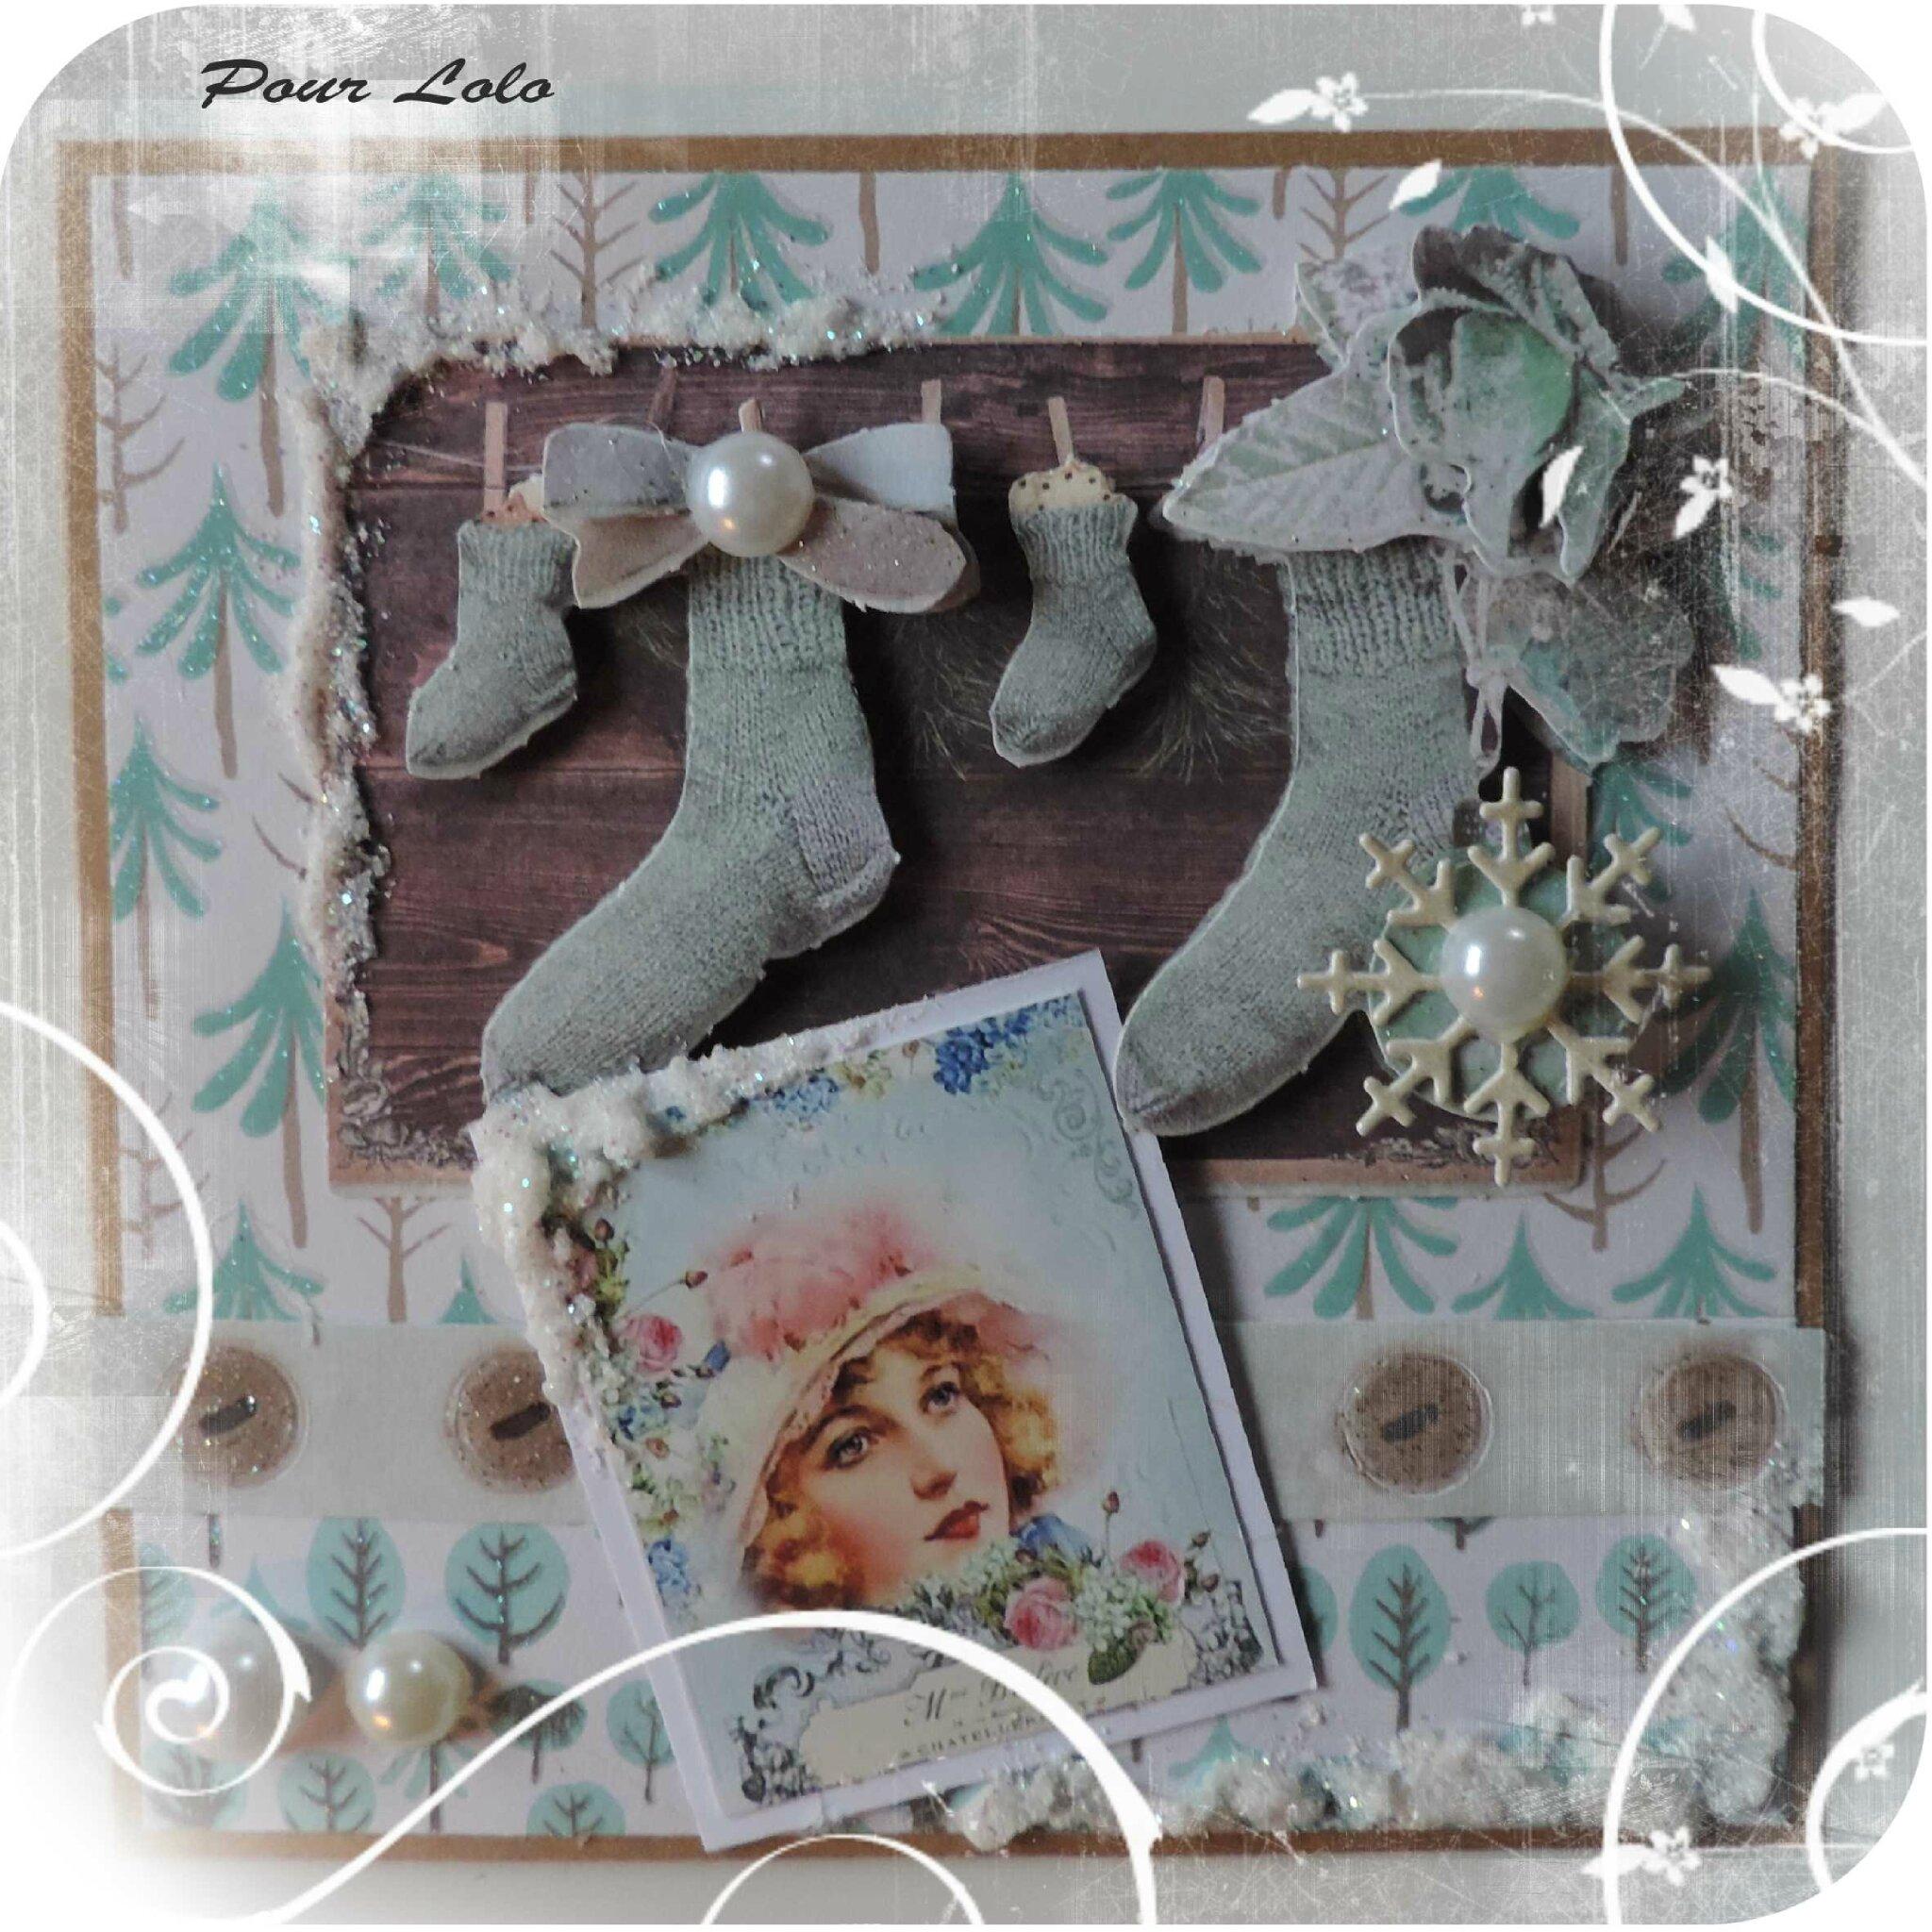 Pour Lolo * Noël 2016